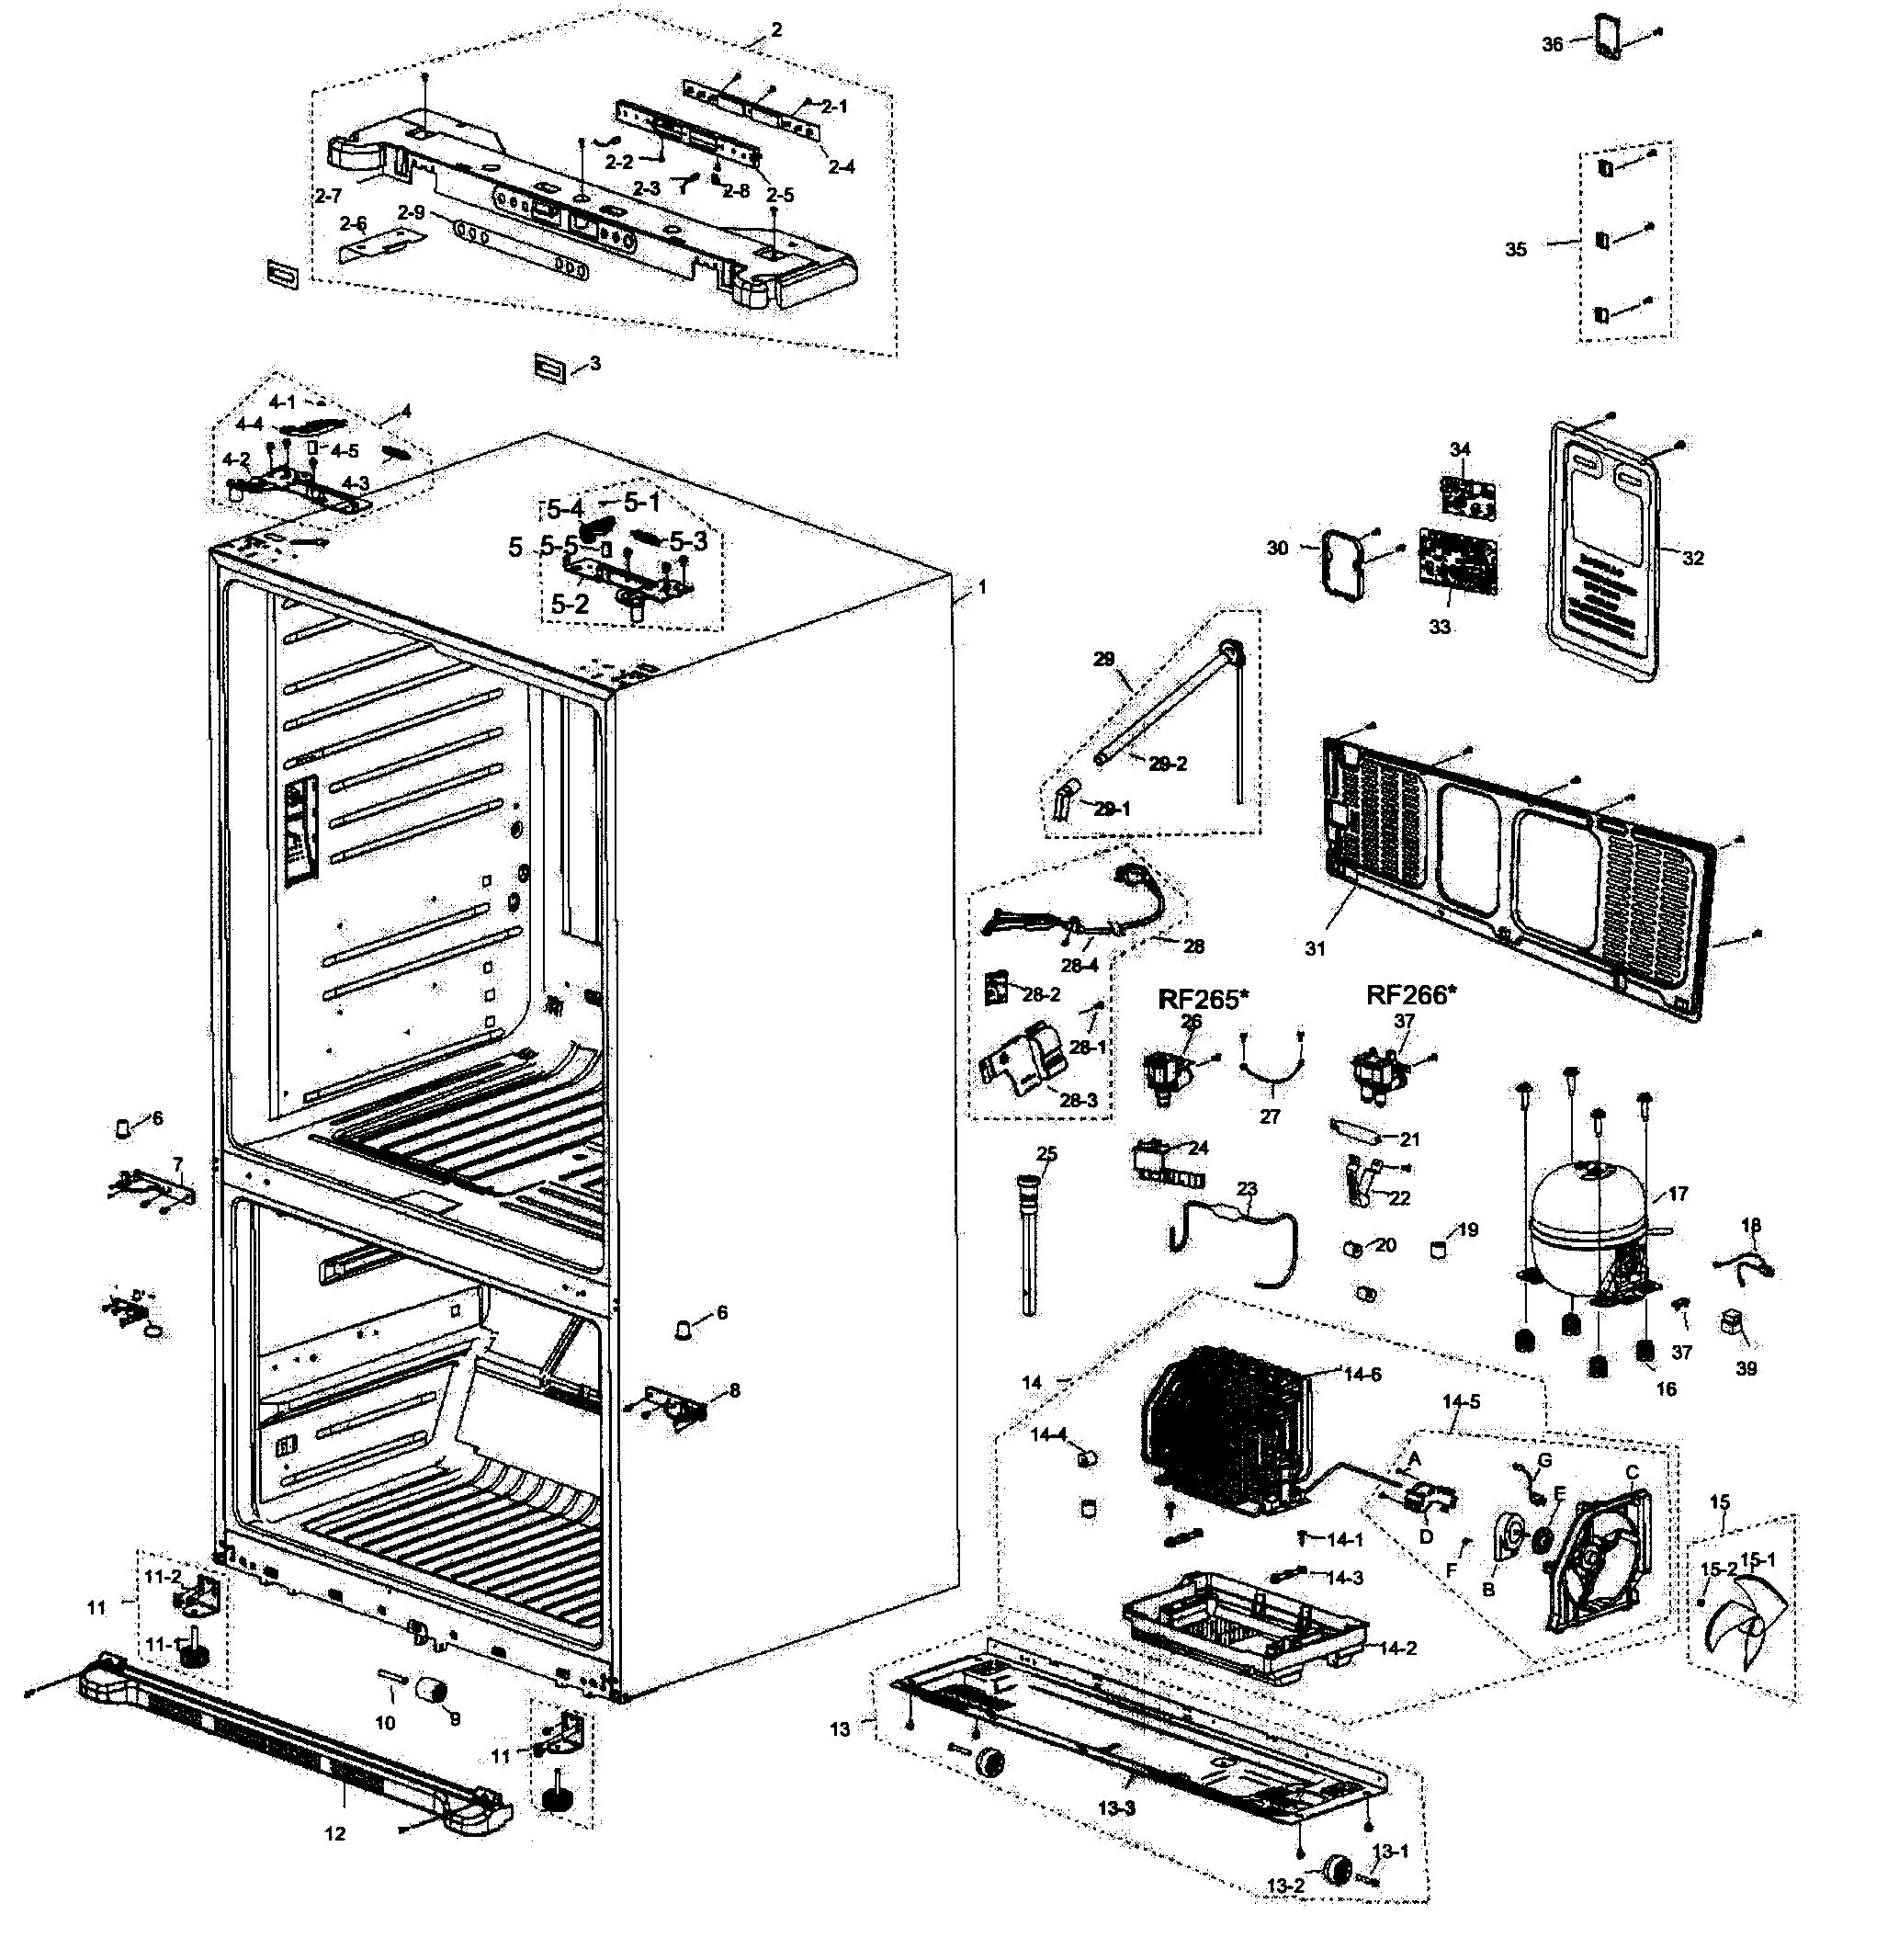 French Door Refrigerator: Parts For Samsung French Door